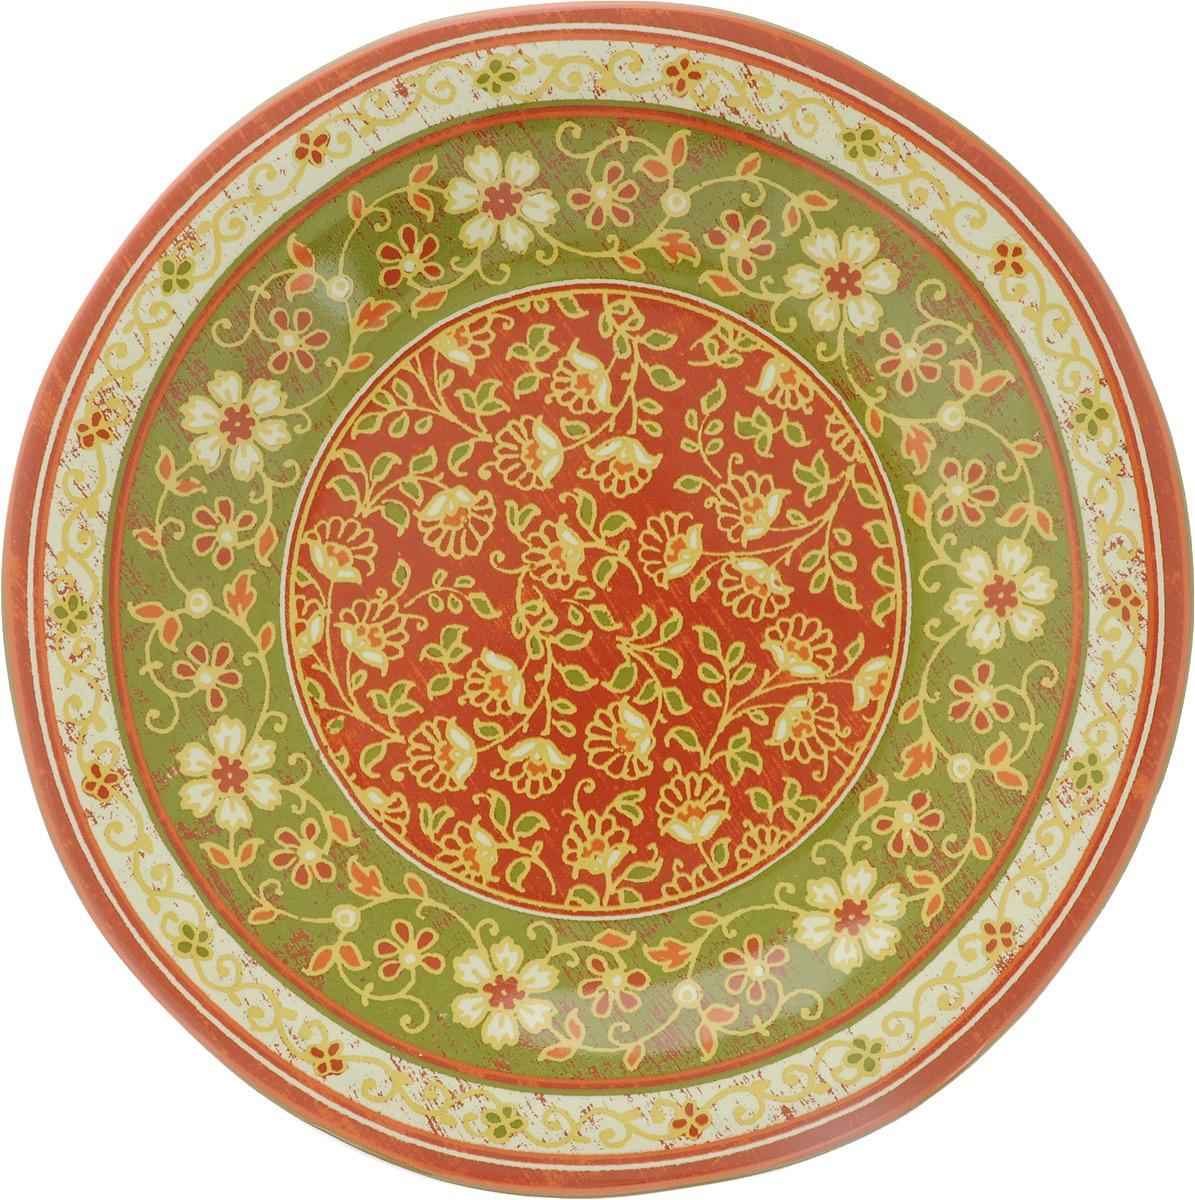 Тарелка десертная Sango Ceramics Кашмир, диаметр 23 см тарелка joy fook ceramics 10